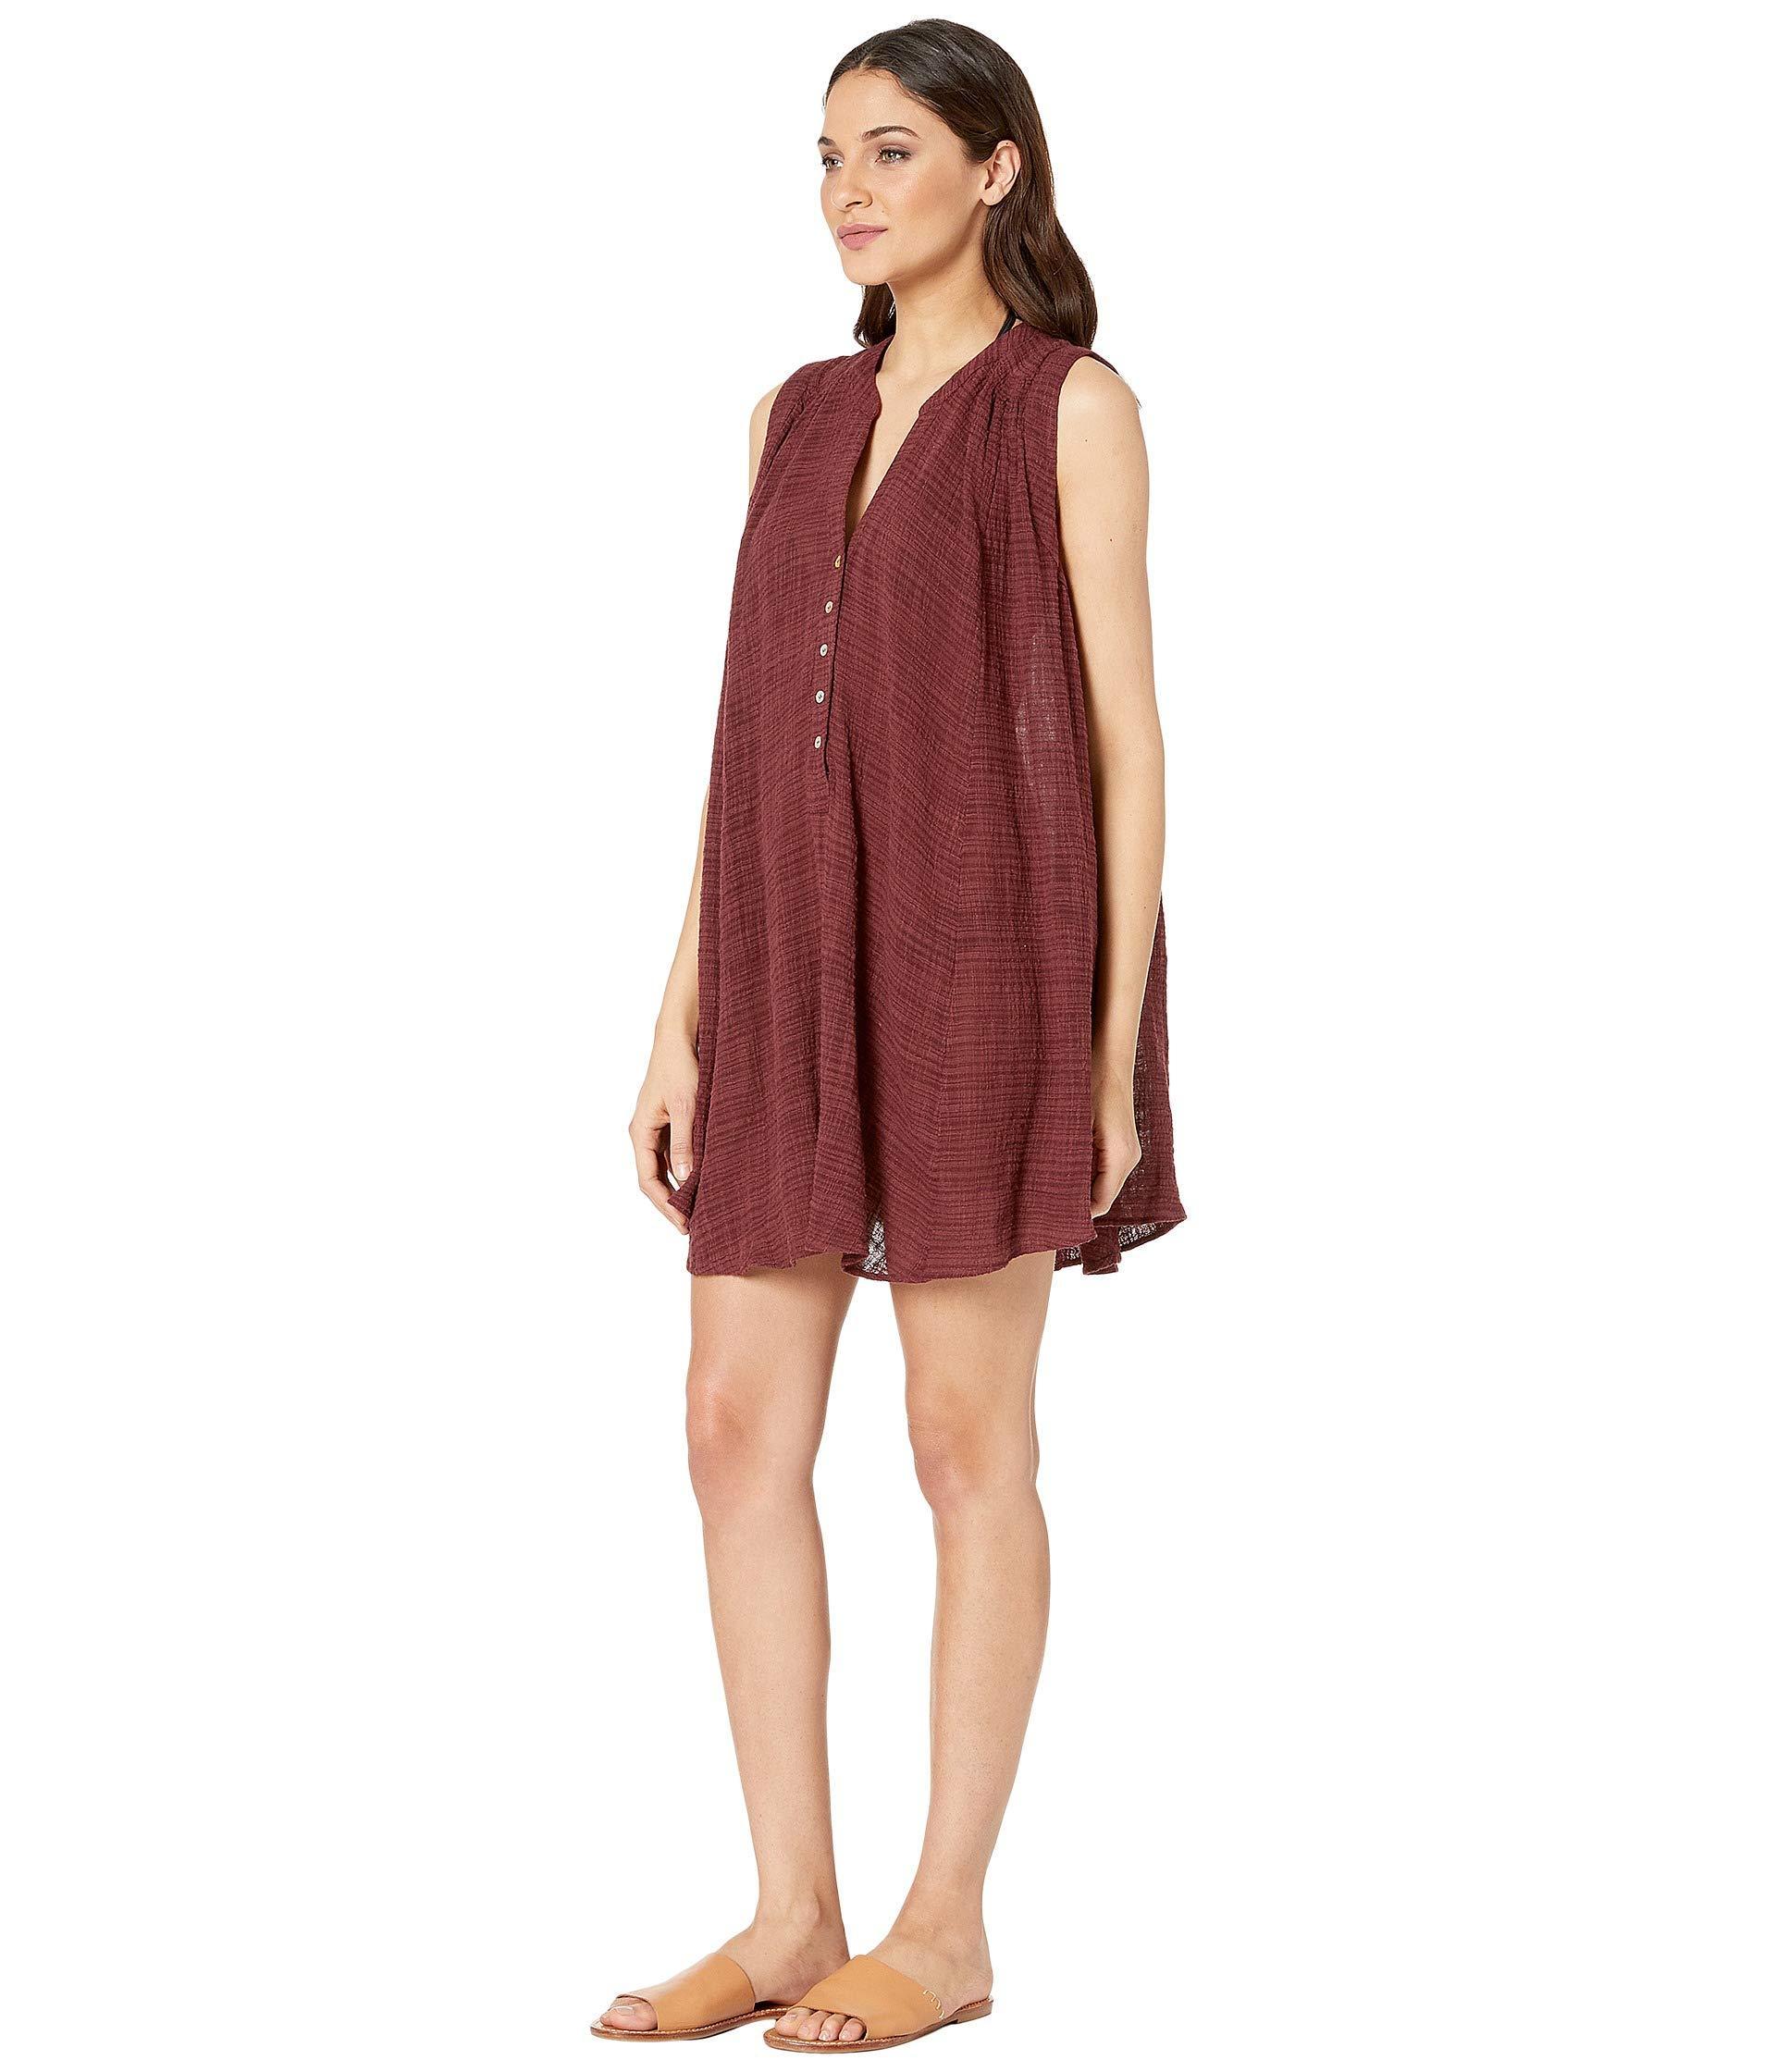 b29501e1ef Lyst - Seafolly Swing Beach Shirt Cover-up (plum) Women's Swimwear in Red